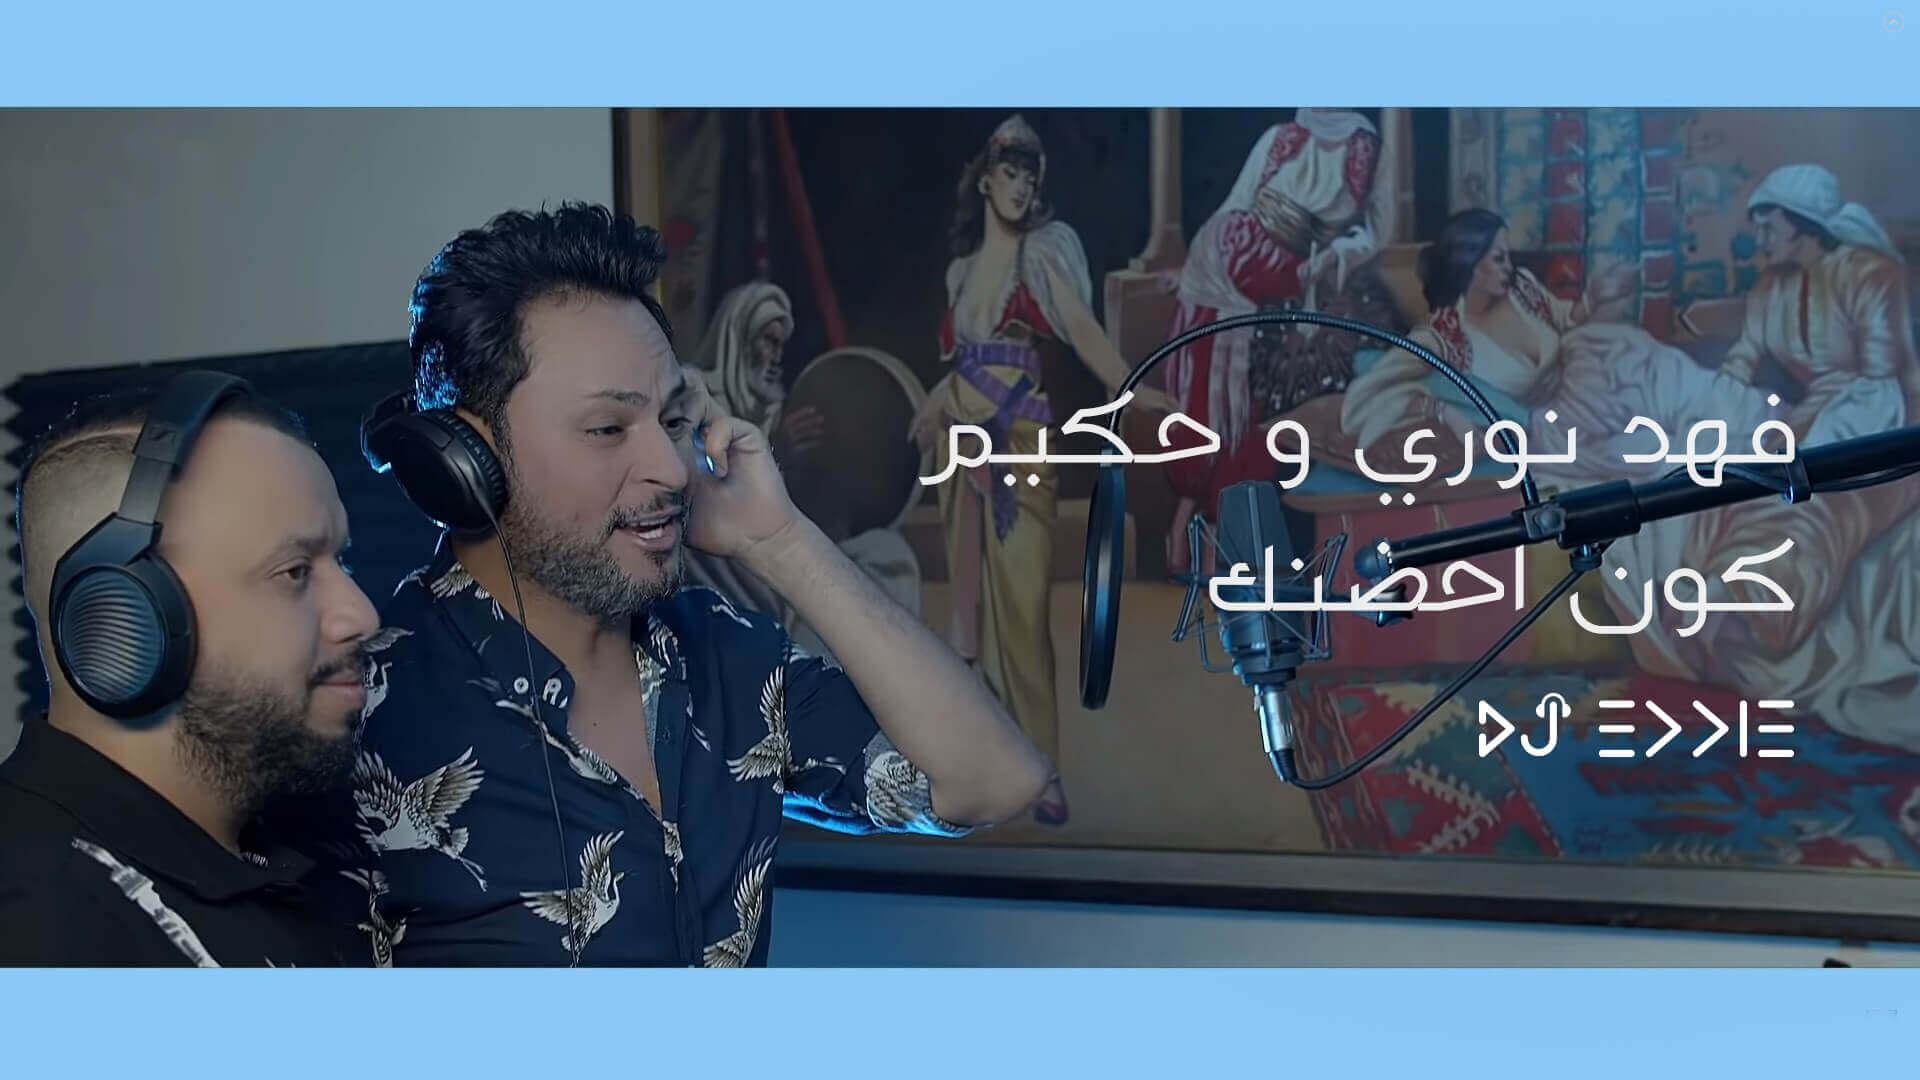 فهد نوري و حكيم – كون احضنك Fahed Nouri & Hakim – Koun Ahednak